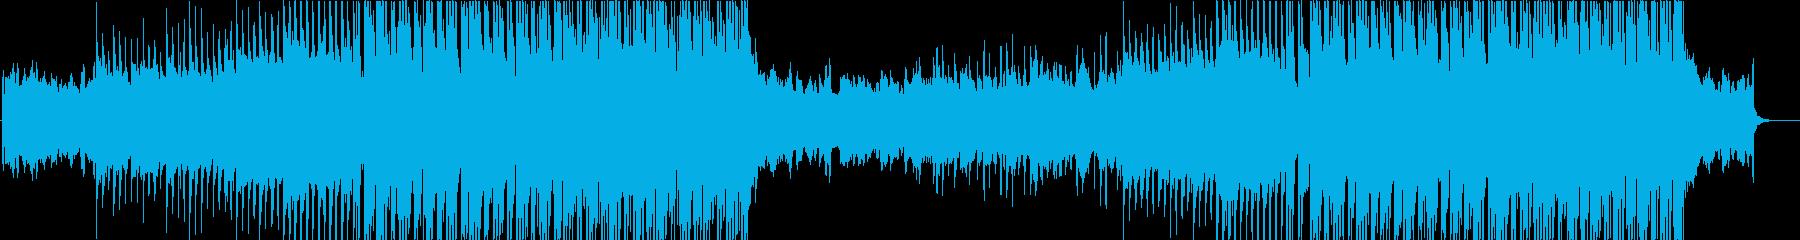 Rising guitar rock, EDM-like synth development's reproduced waveform